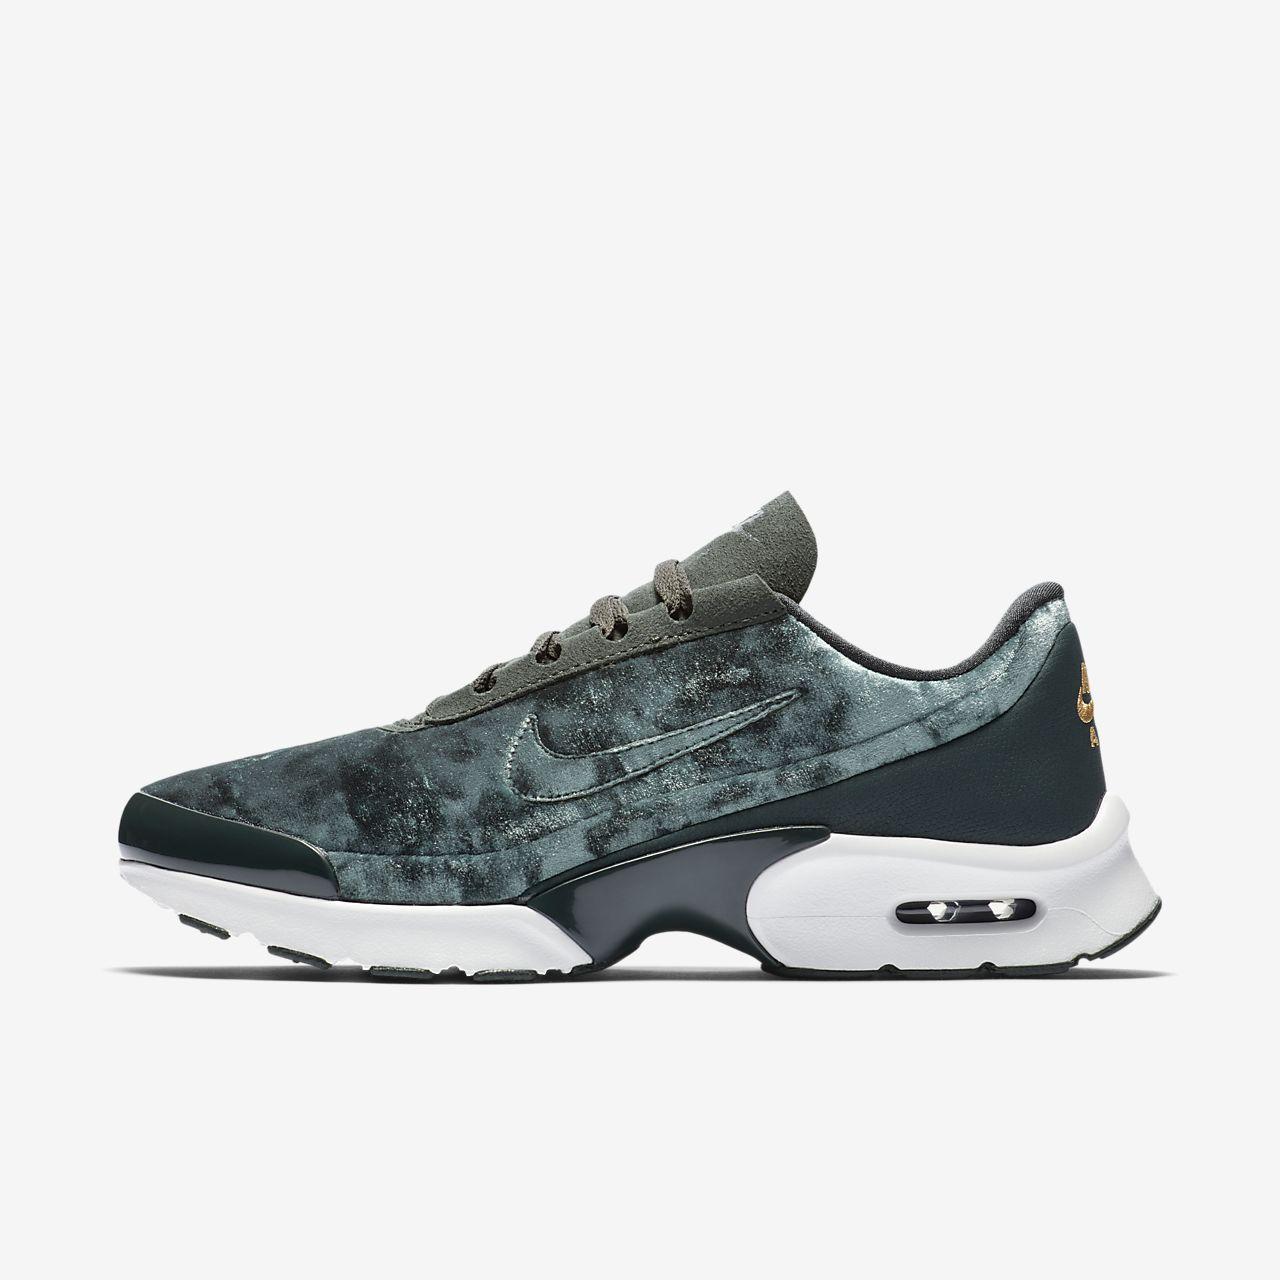 03e3fa20d092 Nike Air Max Jewell Premium W Lo Sneaker Schuhe grün Limitierte ...